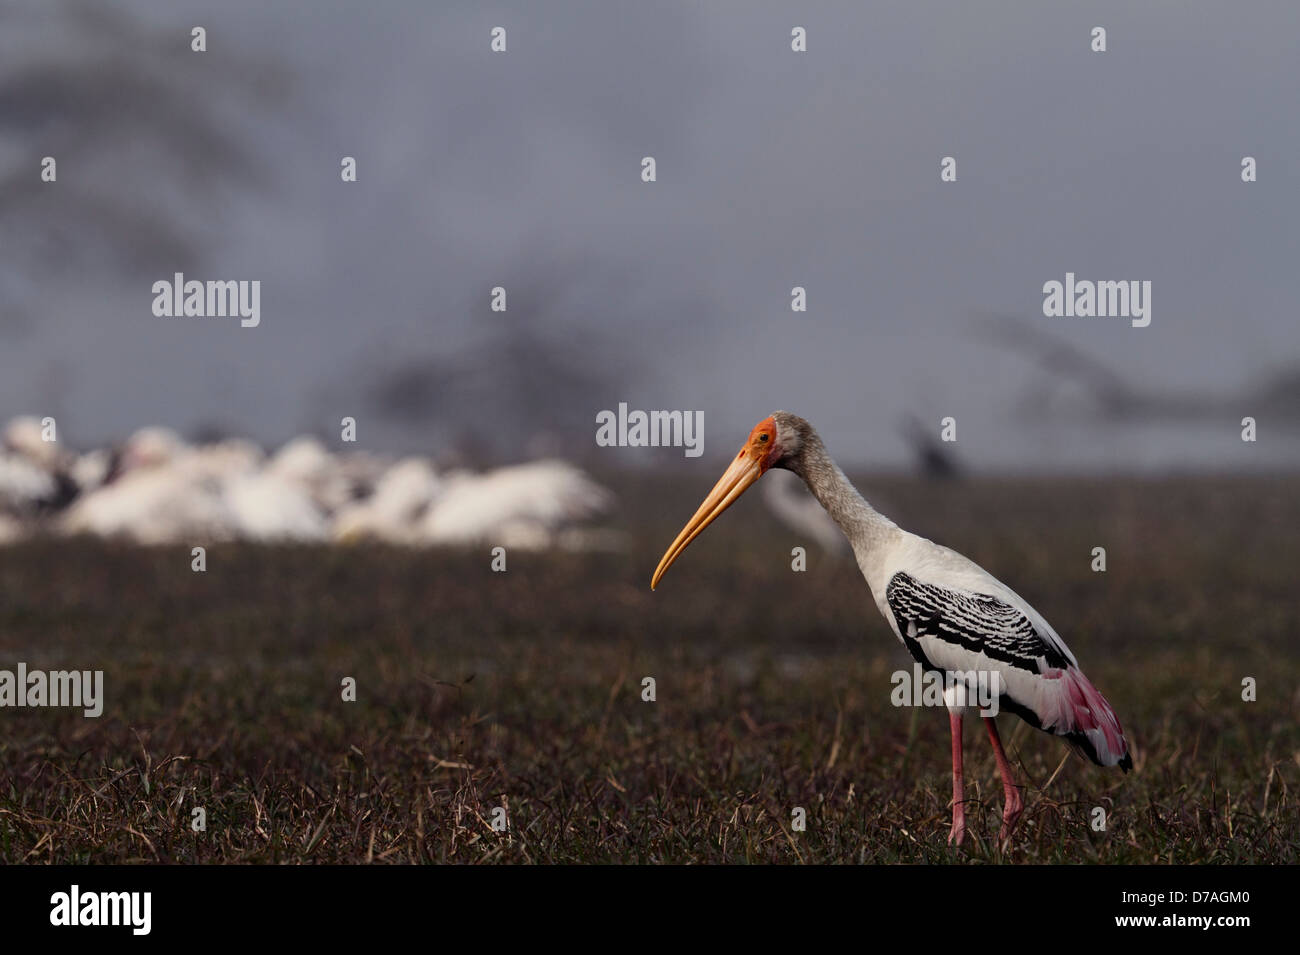 Painted Stork in Keoladeo National park, Bharatpur, rajasthan, India - Stock Image